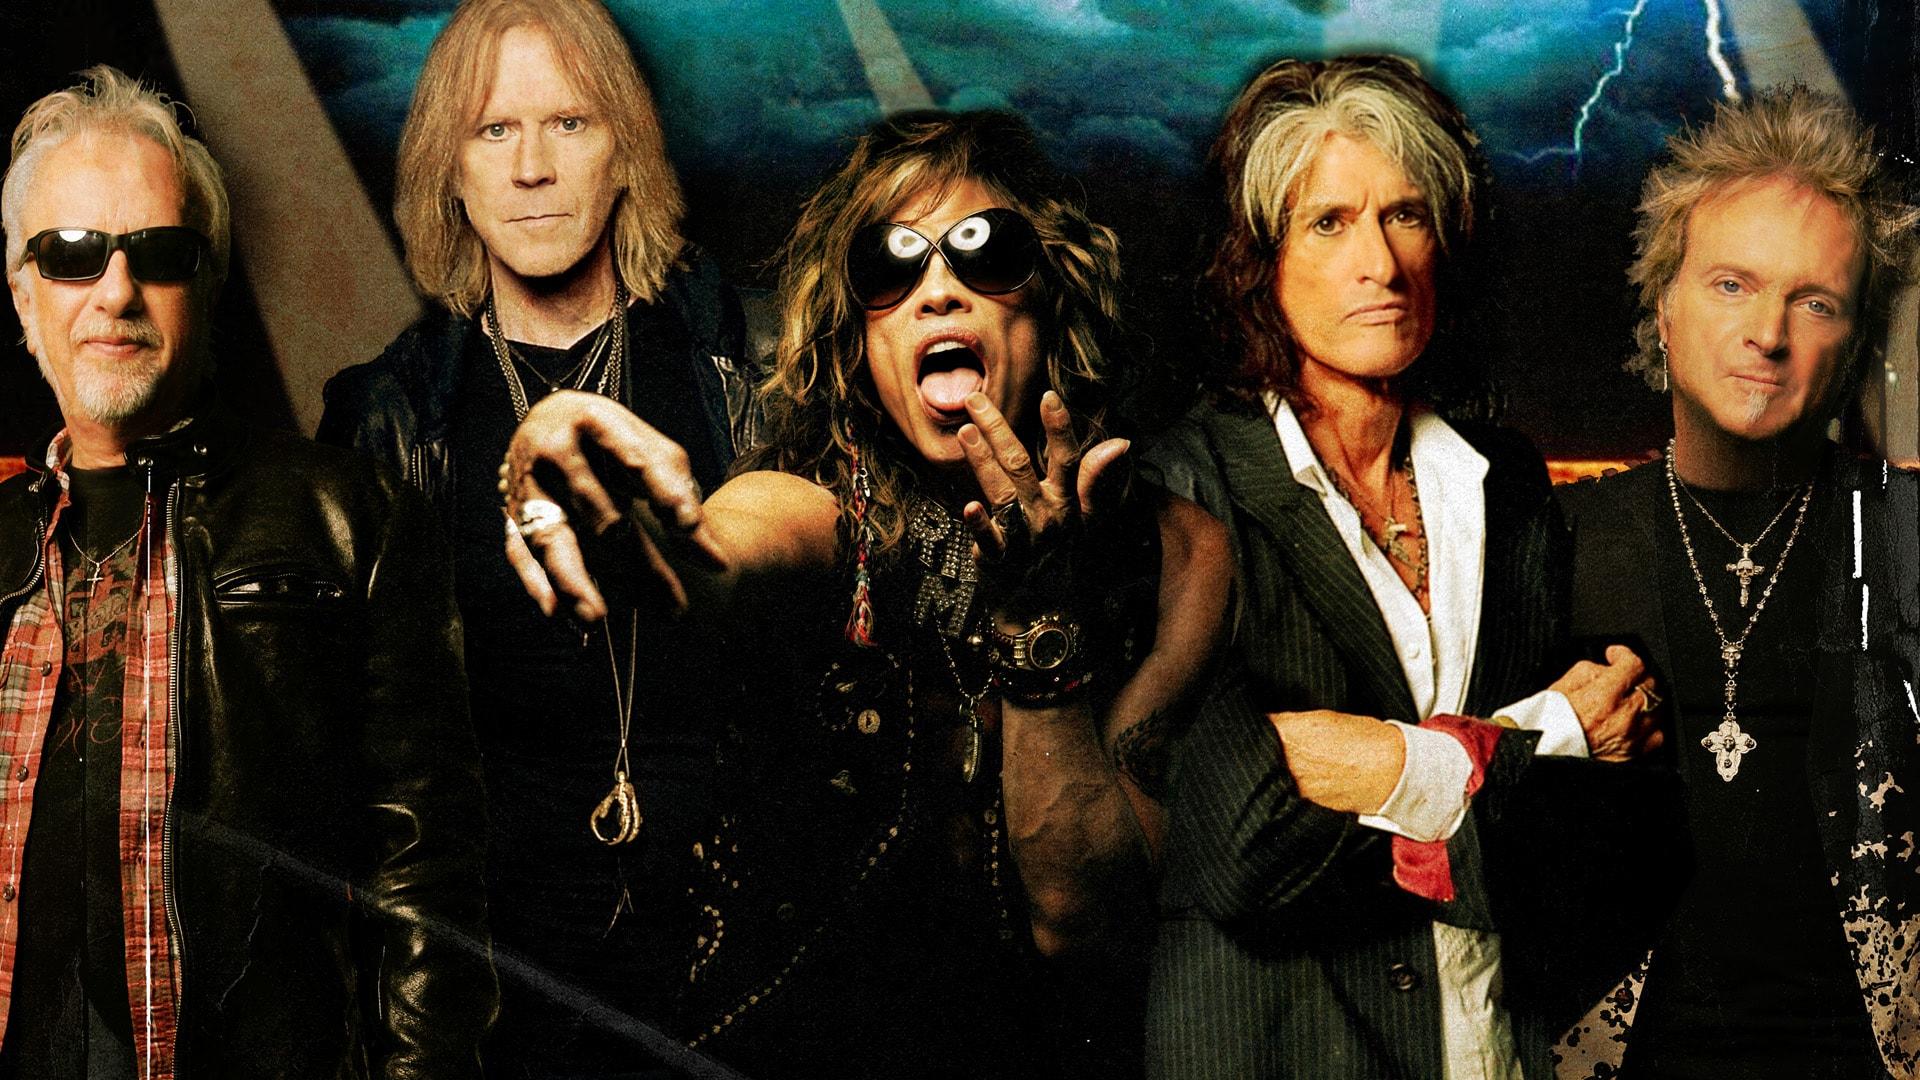 Aerosmith Wallpapers Hd Backgrounds